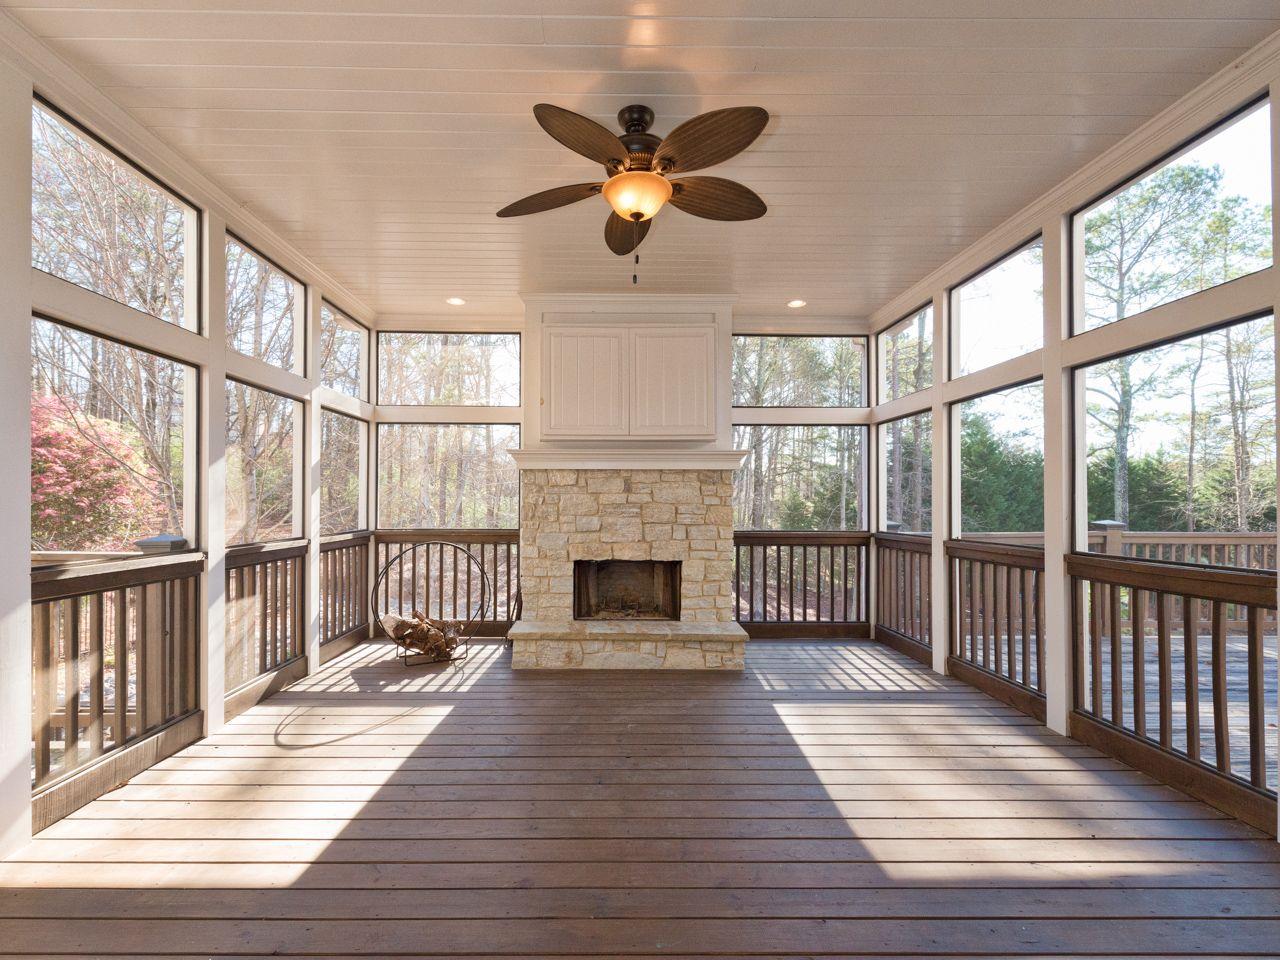 3322 Ebenezer Farm Marietta 30066 Mls 5815830 5 Beds 4 Baths With A Basement Incredible Valu Porch Design Screened Porch Designs Porch Fireplace